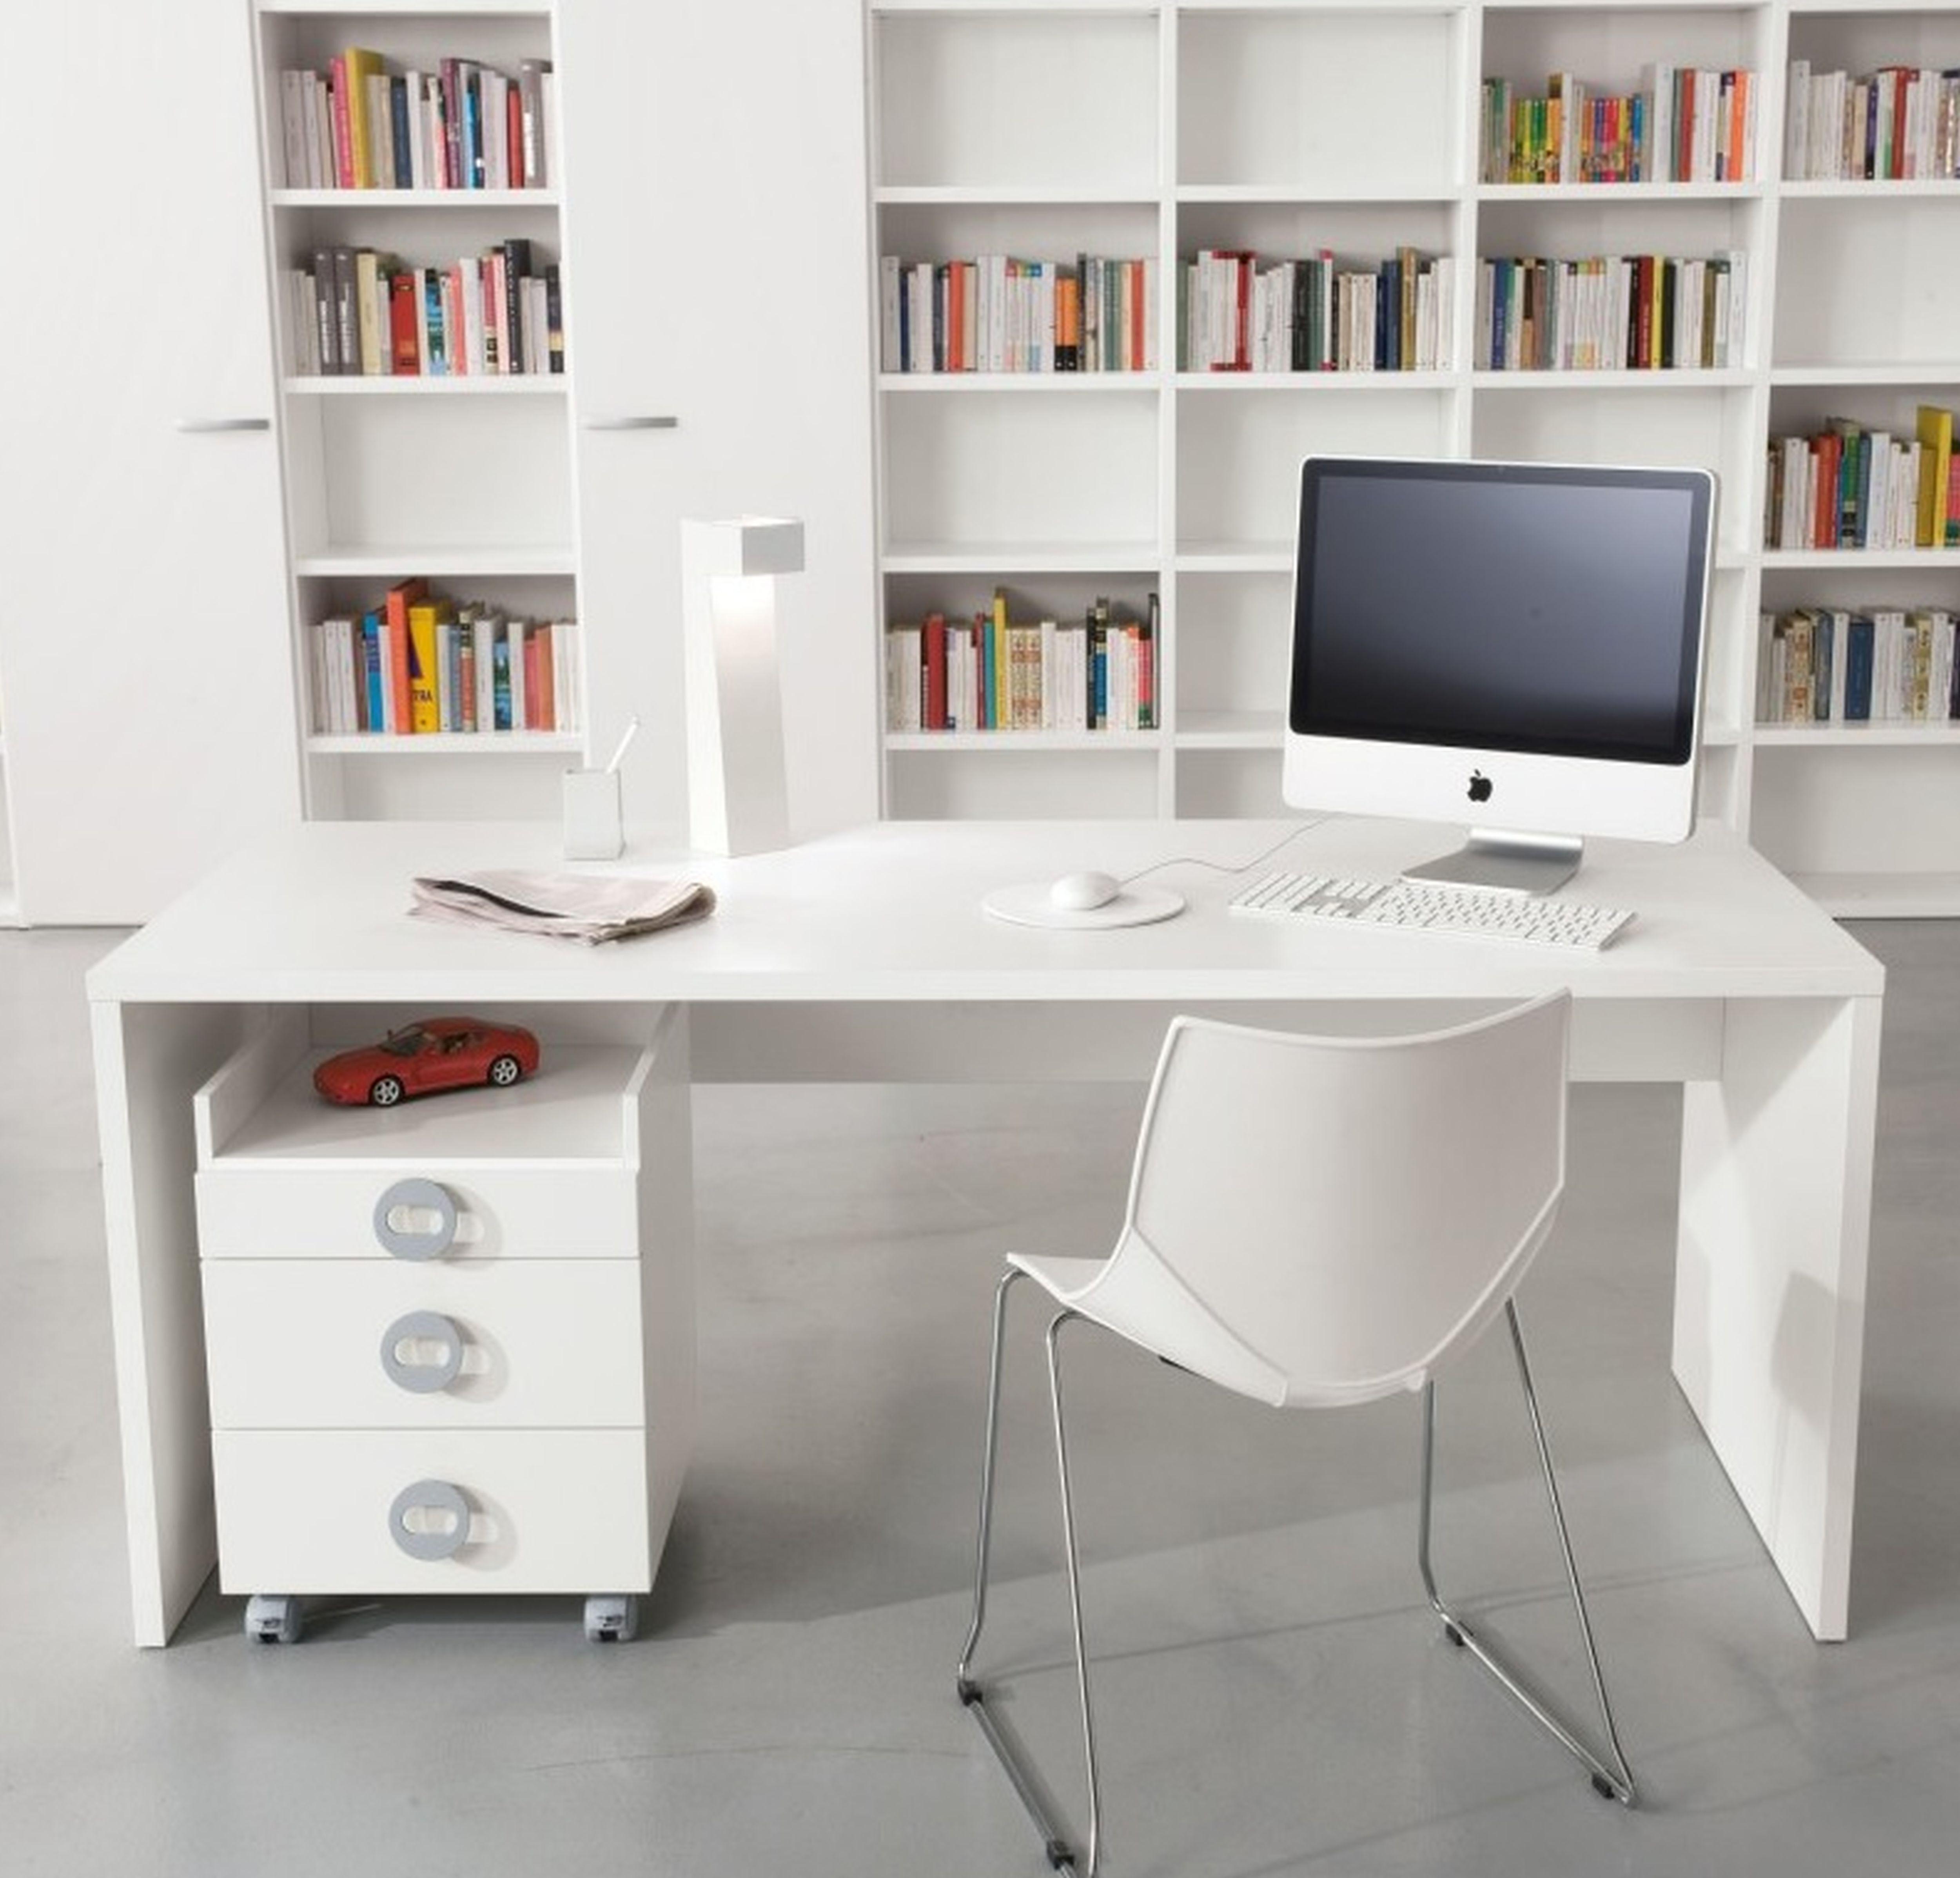 افكار غرف مكتب مودرن | المرسال